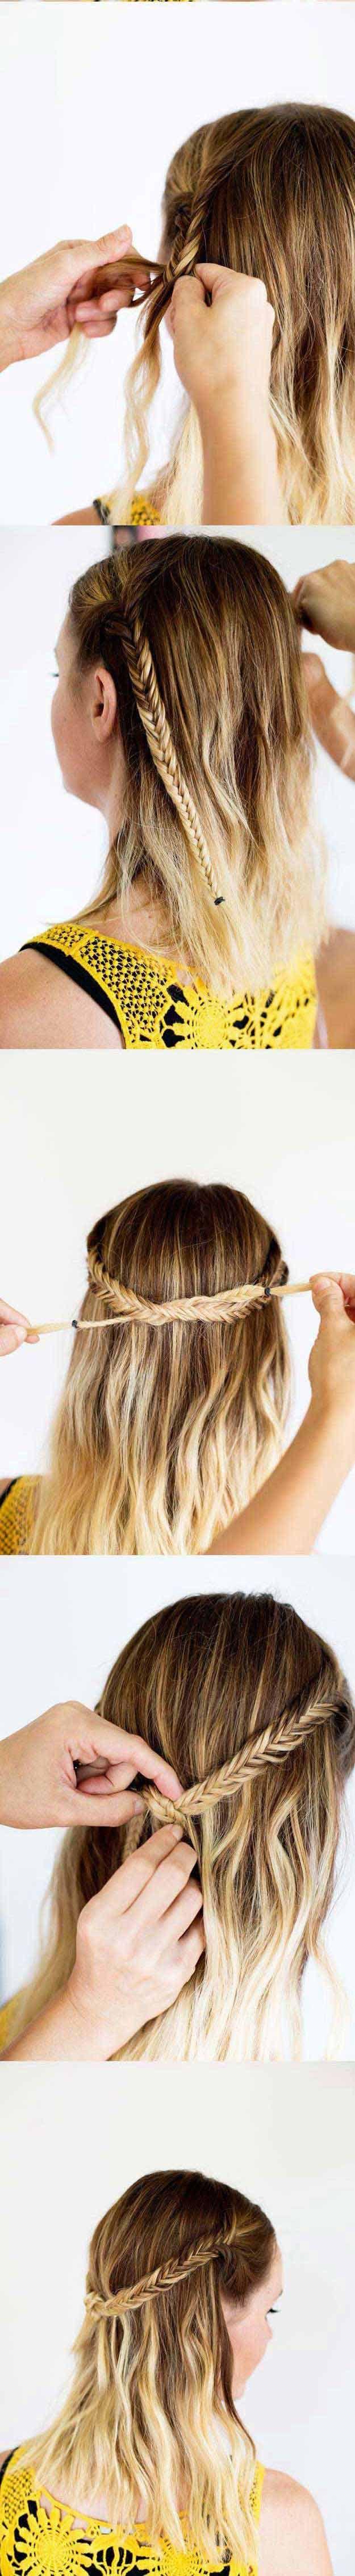 347 best Hairstyles for Medium Length Hair images on Pinterest